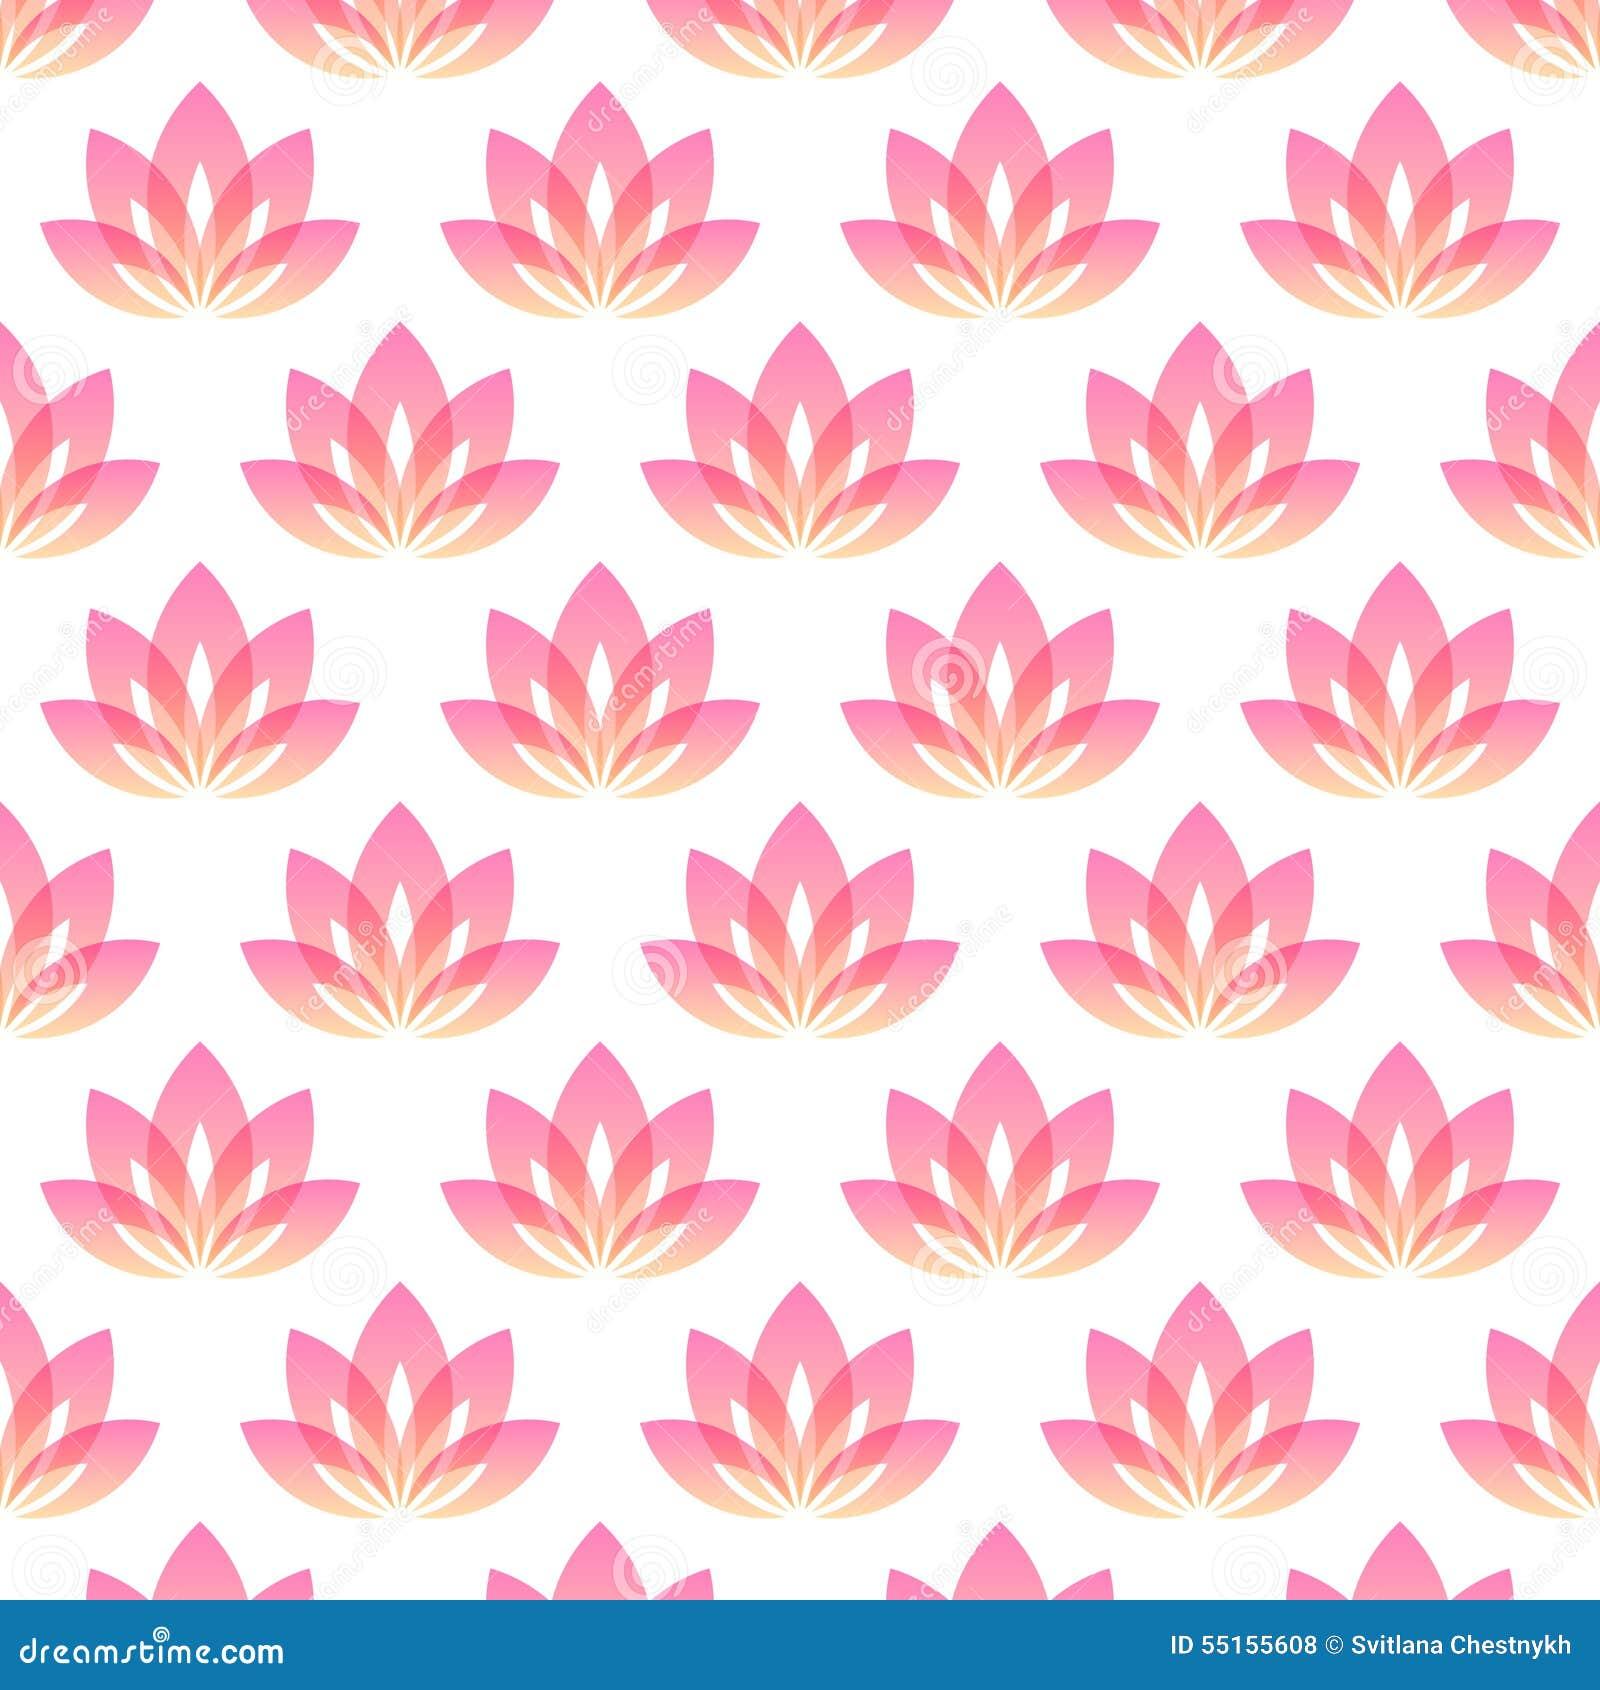 Yoga pattern background seamless pattern with five petals lotus flower - Flower Lotus Seamless Symbol Vector Web Yoga